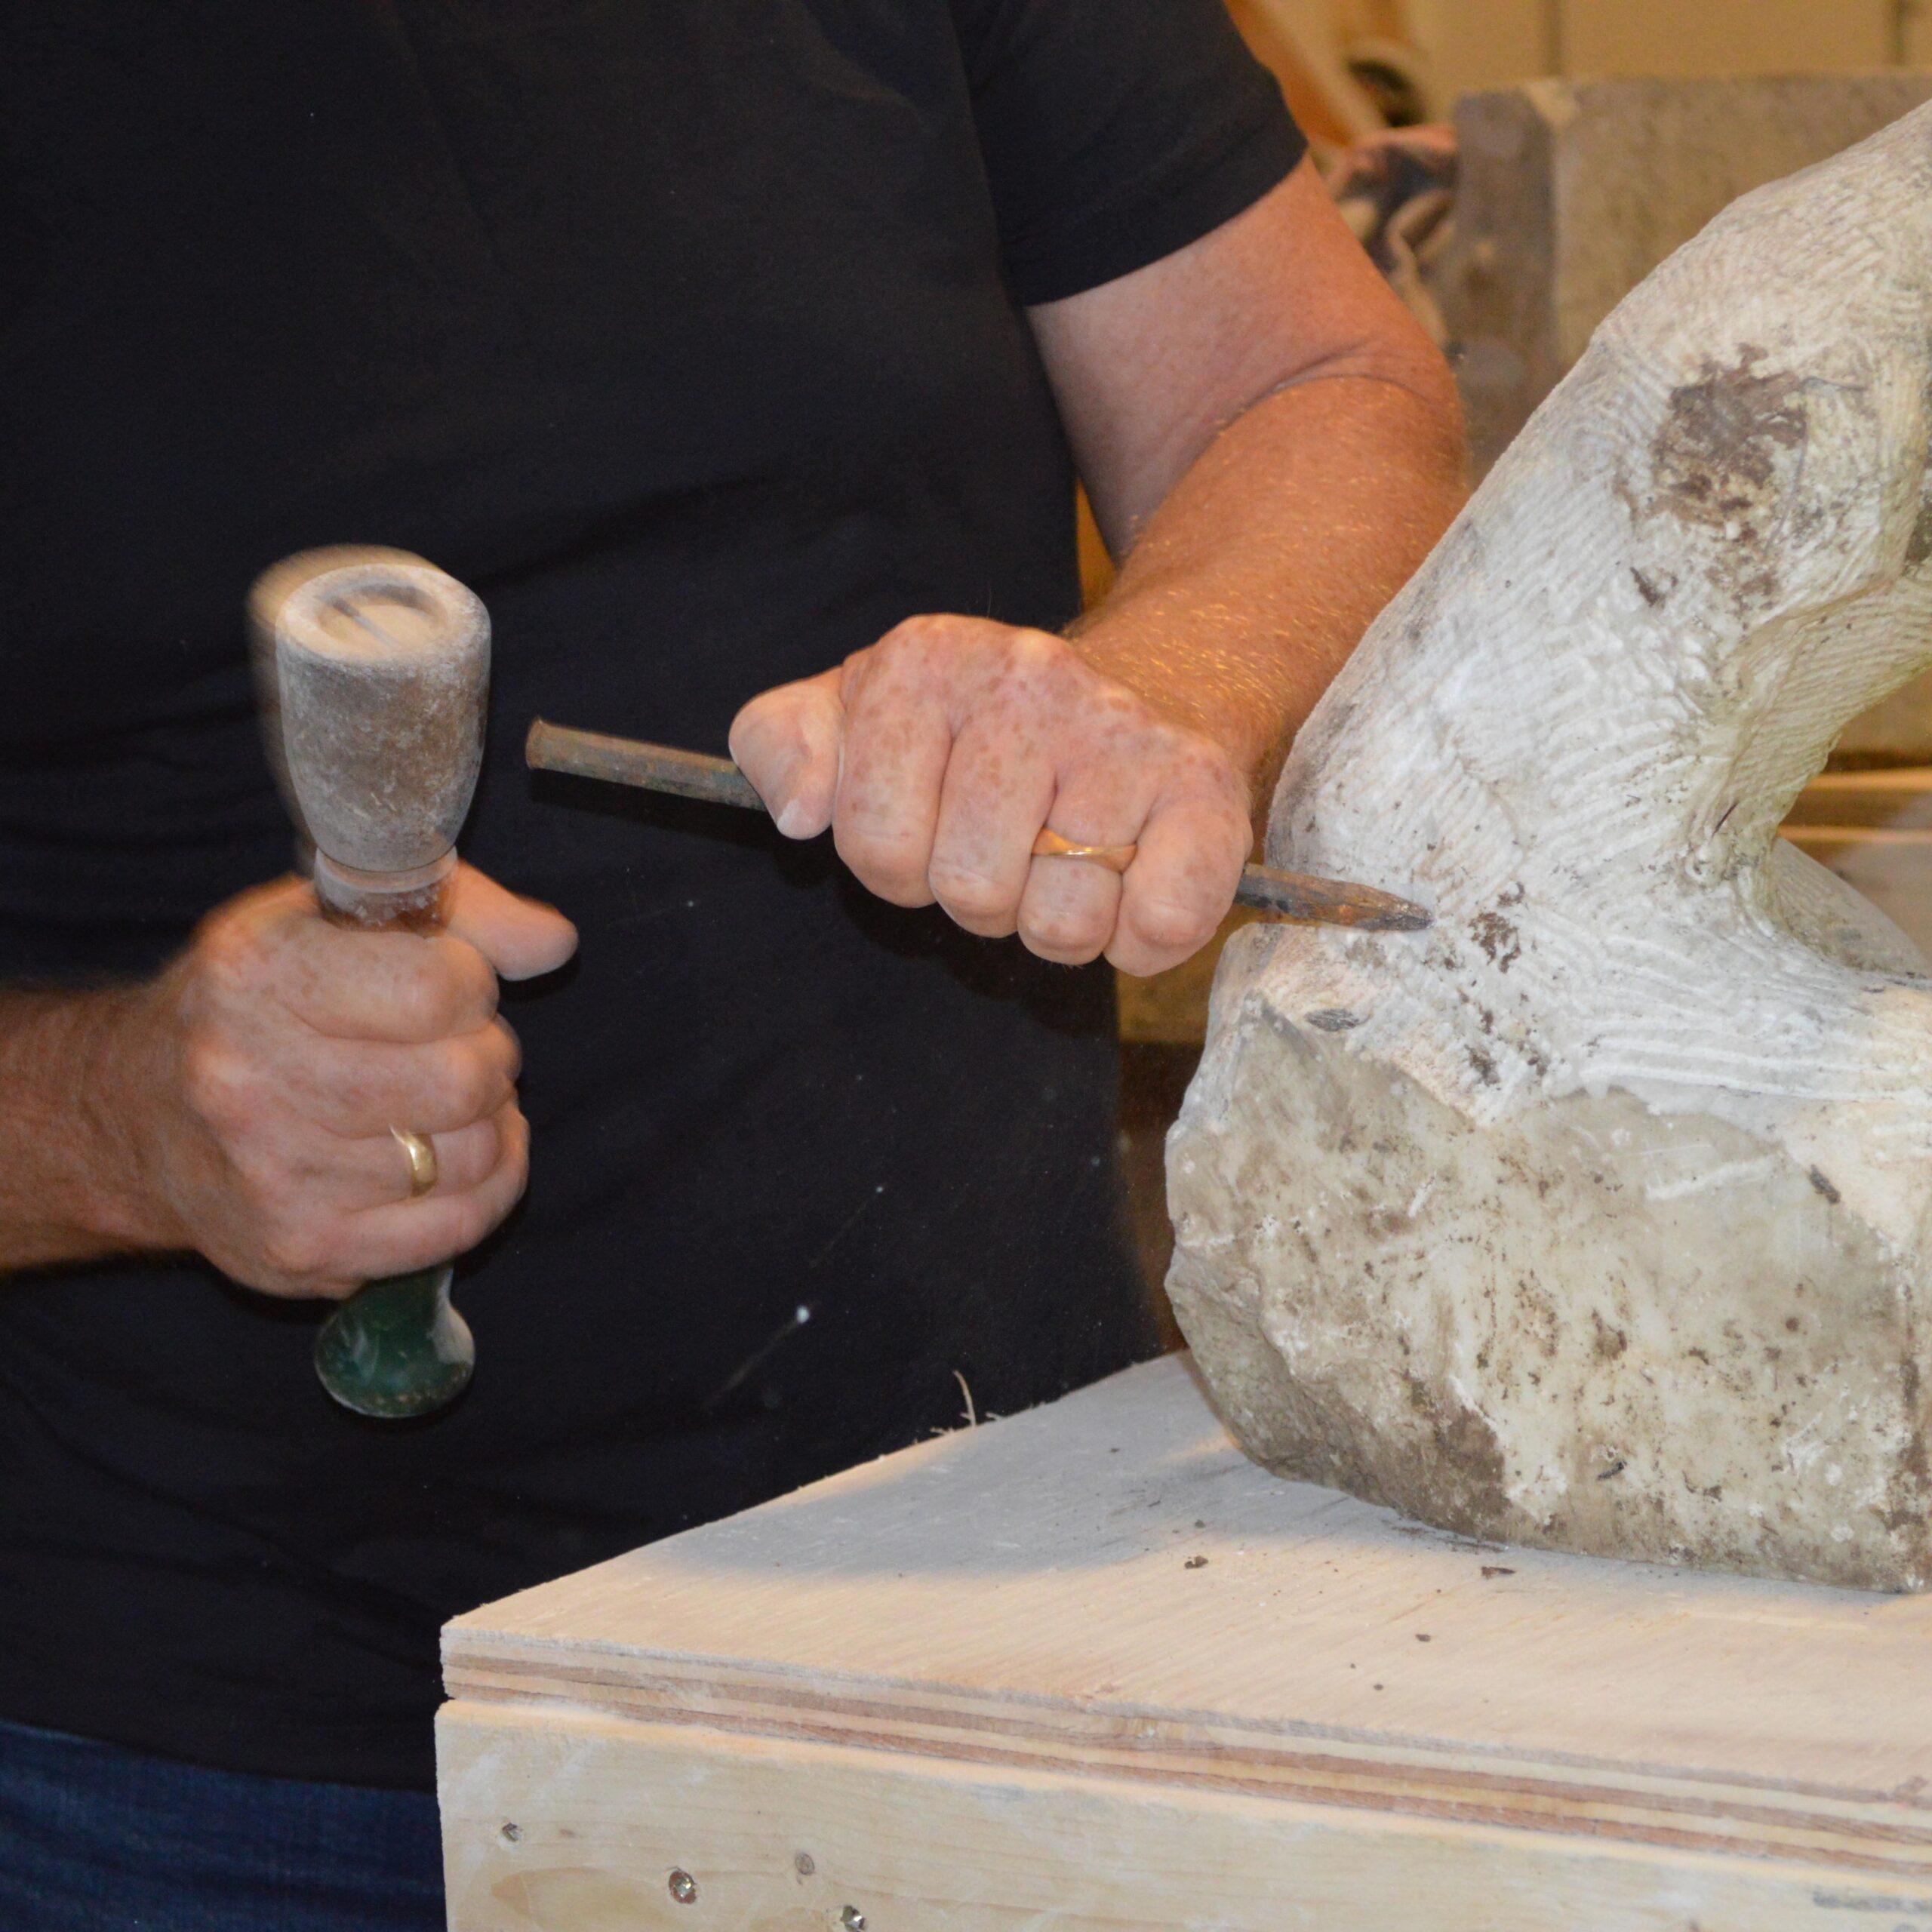 michael binkley sculptor stone sculpture workshop studio squamish canada